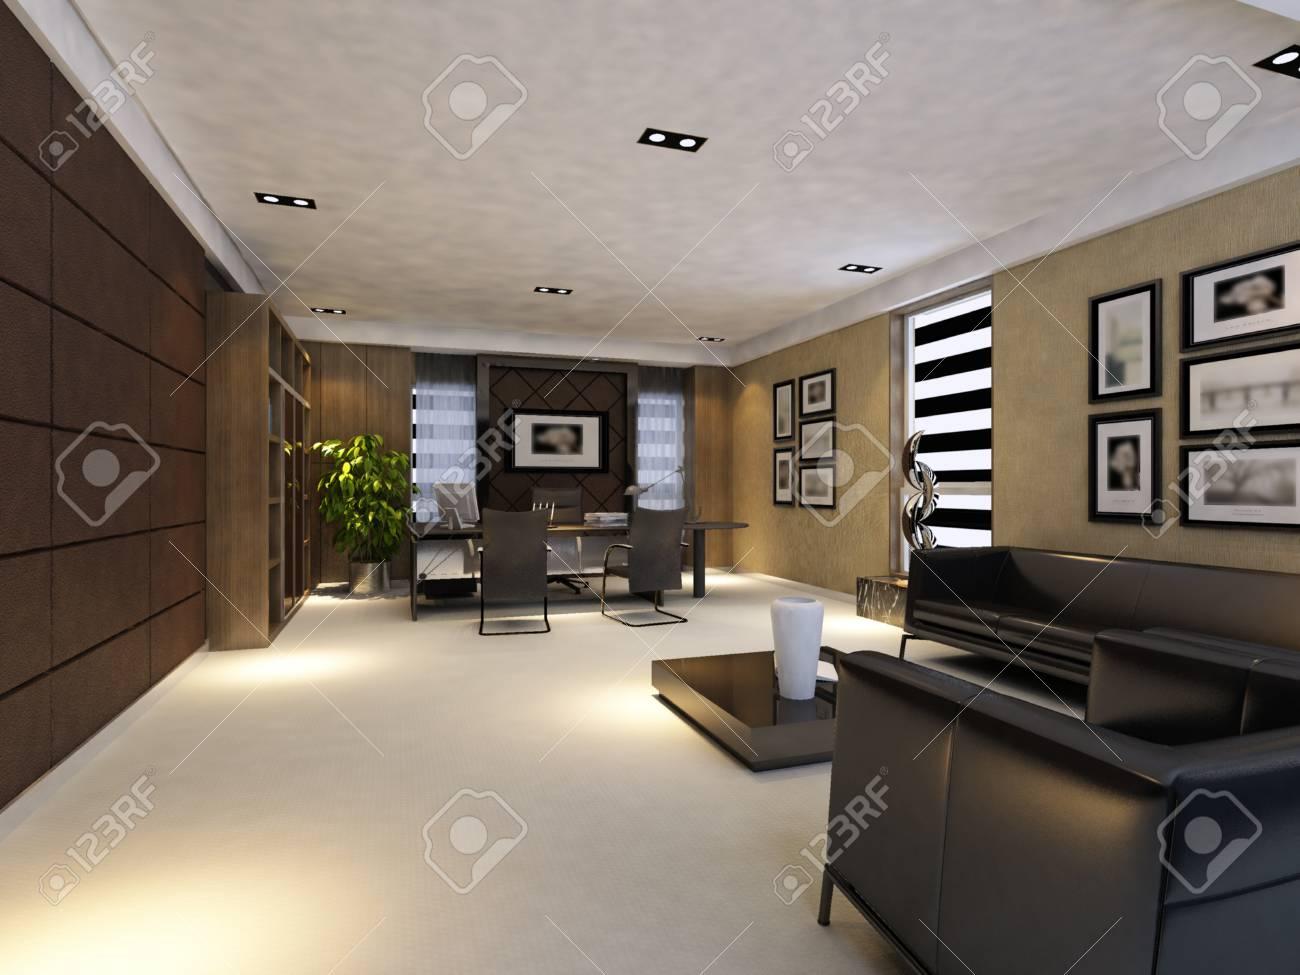 Interior fashionable living-room rendering Stock Photo - 9501451